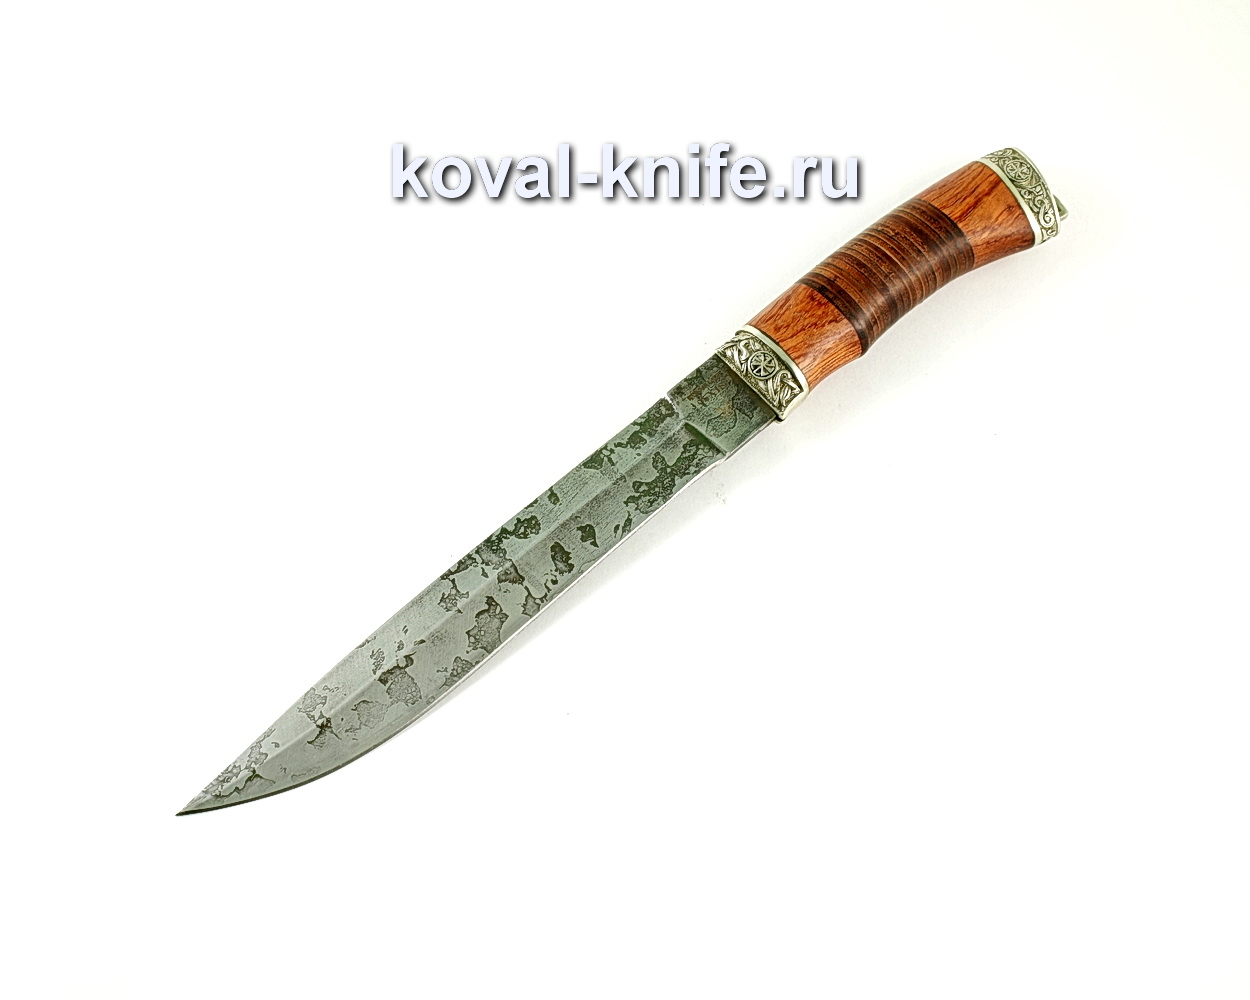 Нож Пластун (сталь95х18), рукоять бубинга, кожа, литье A242